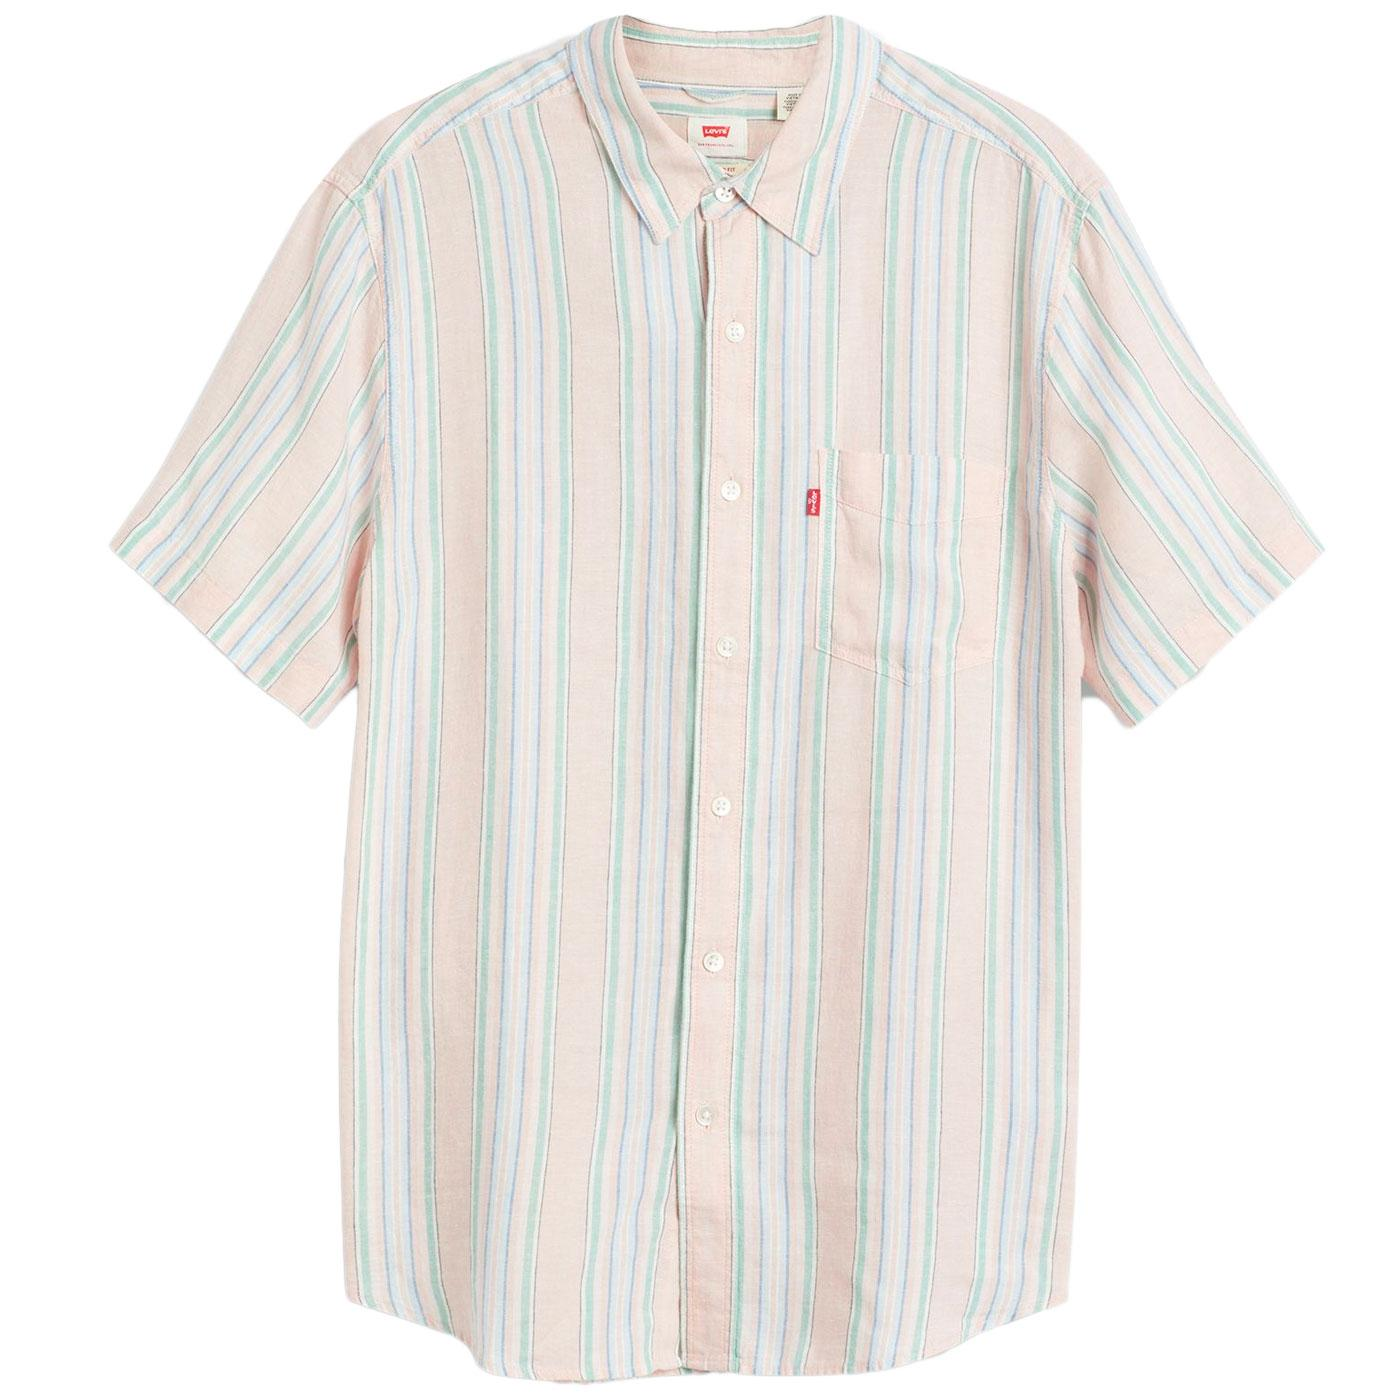 LEVI'S Retro Stripe Linen Blend 1 Pocket Shirt (P)